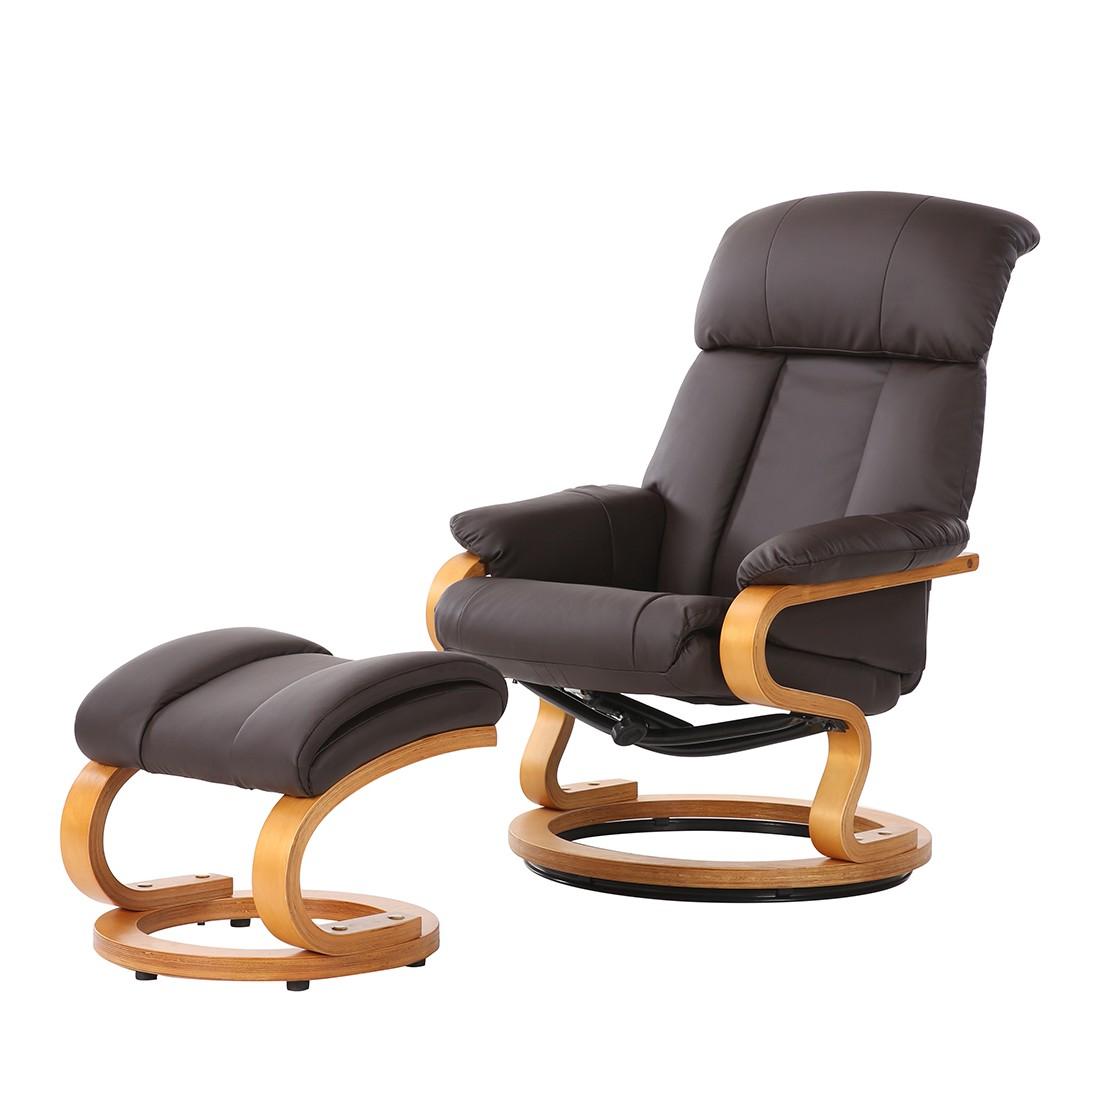 relaxsessel mit hocker braun. Black Bedroom Furniture Sets. Home Design Ideas